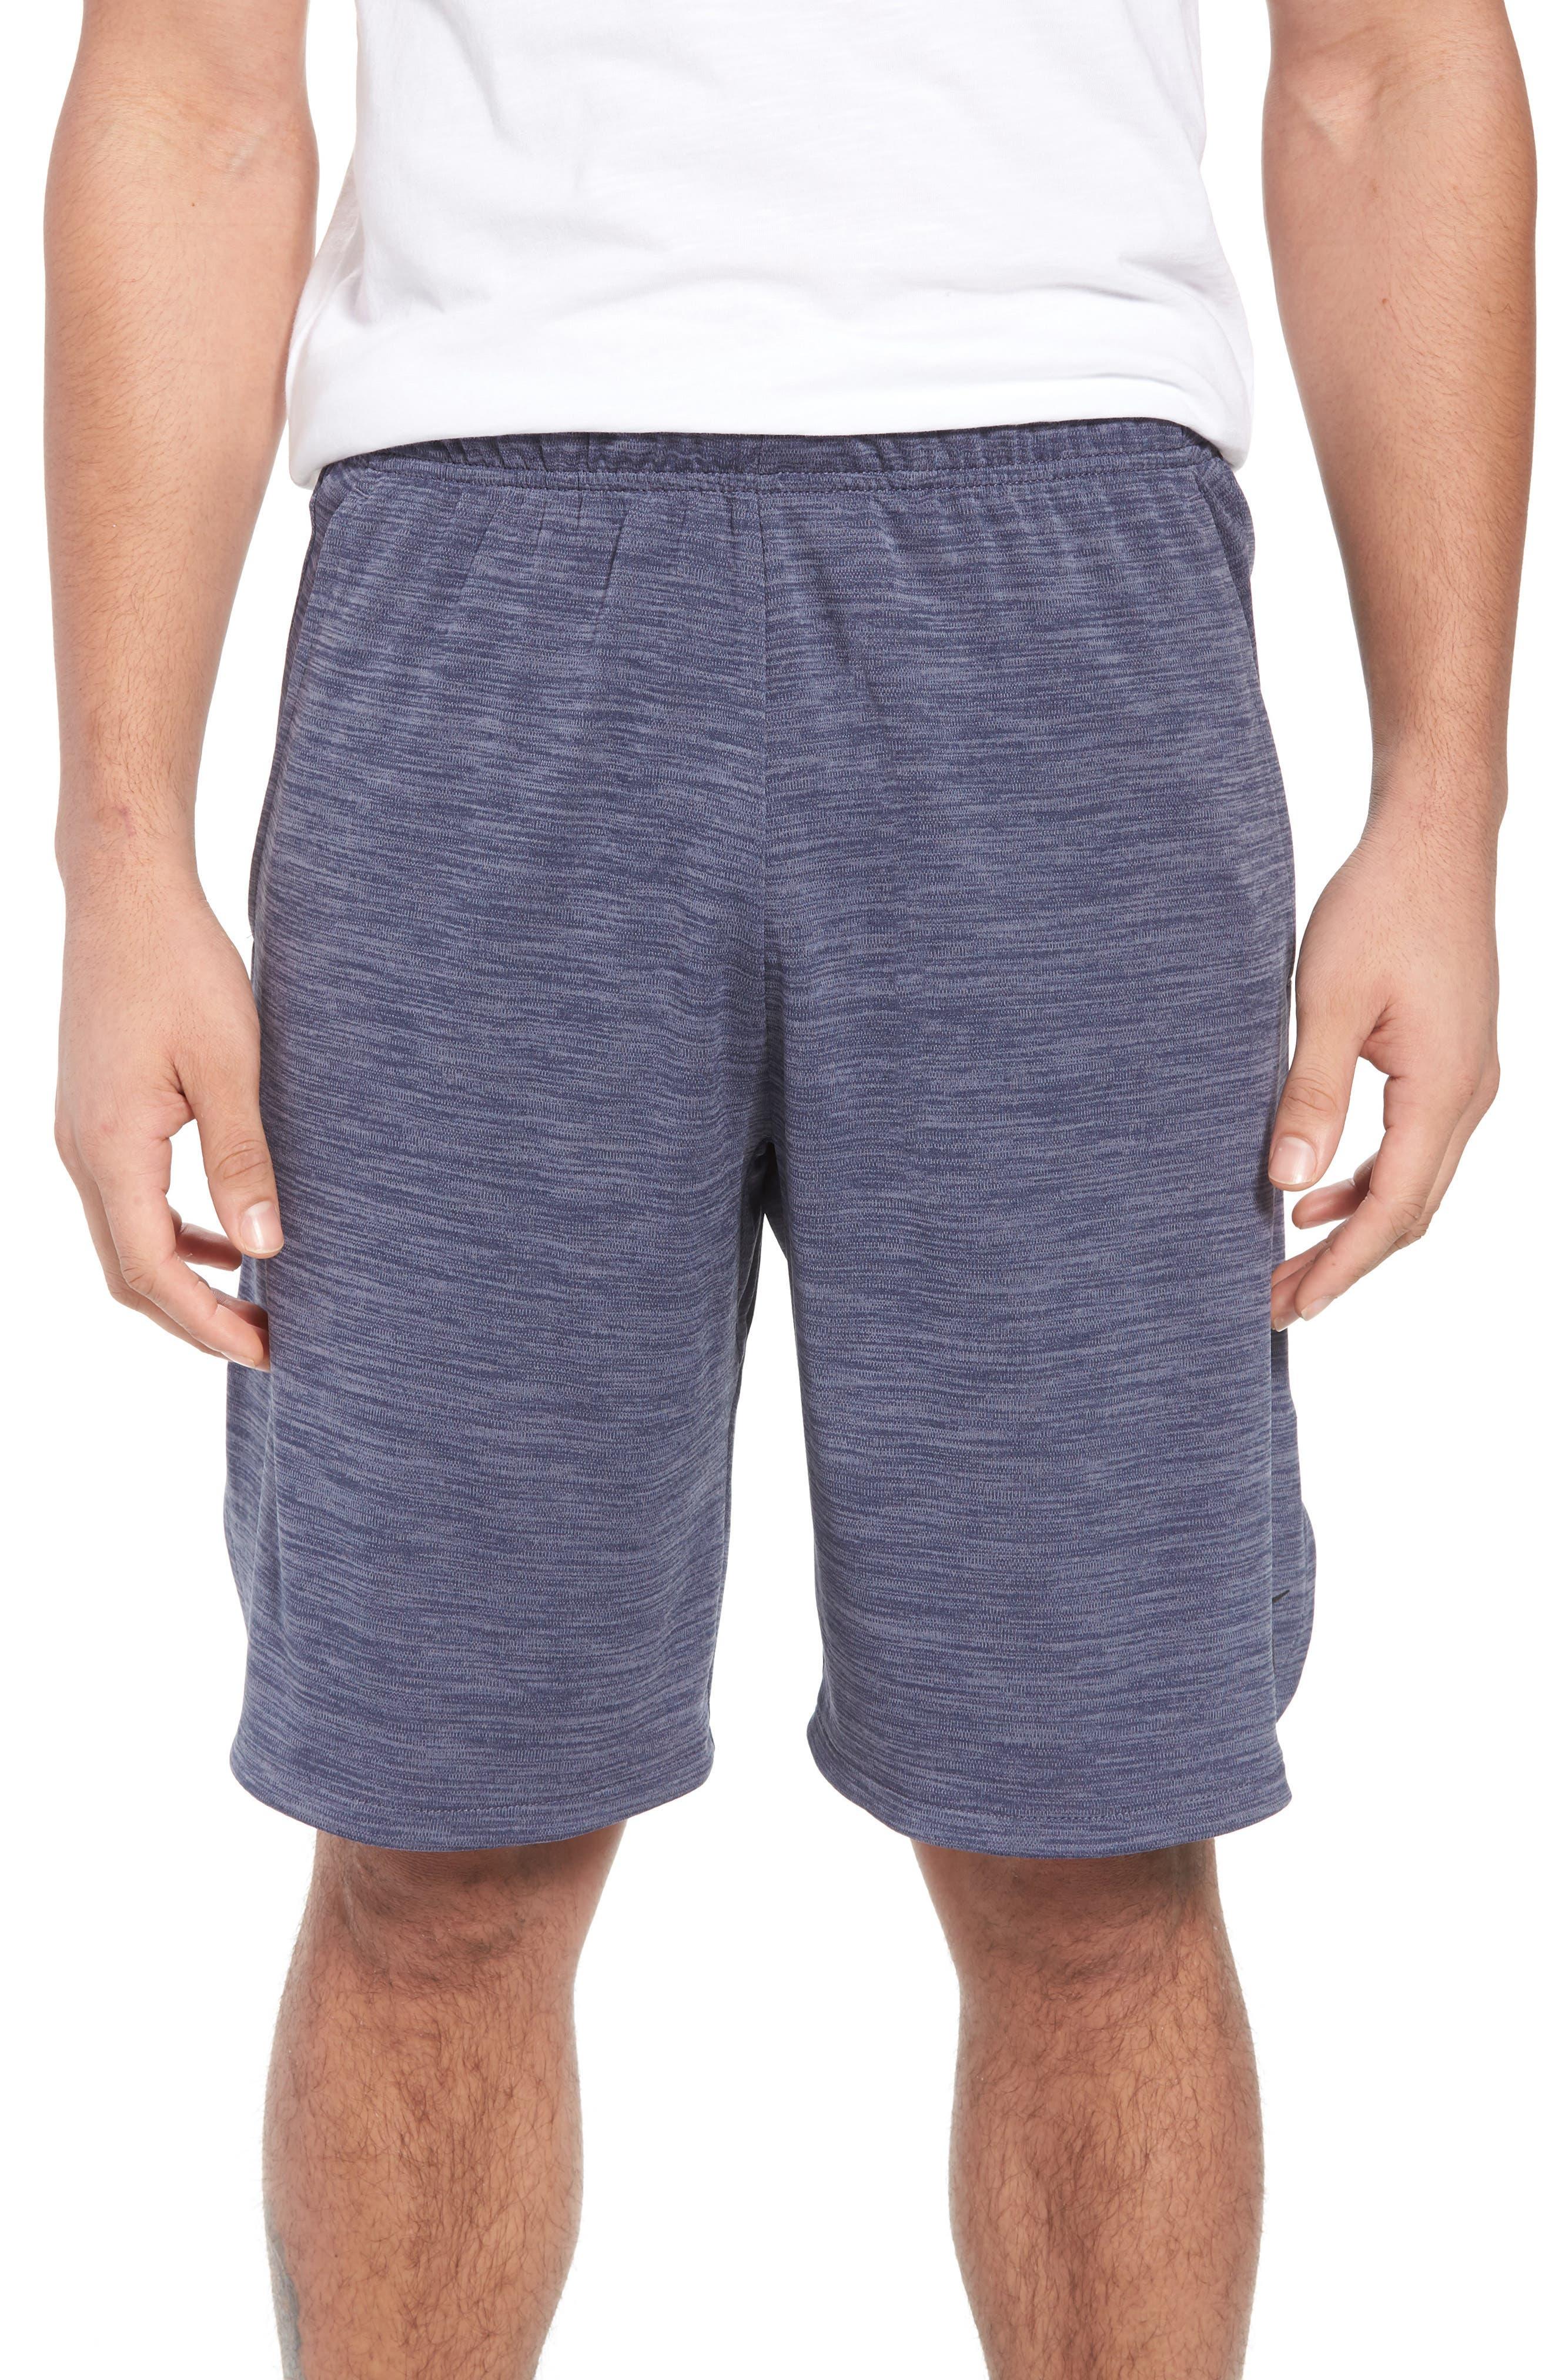 Dry Training Shorts,                         Main,                         color, LIGHT CARBON/ BLACK